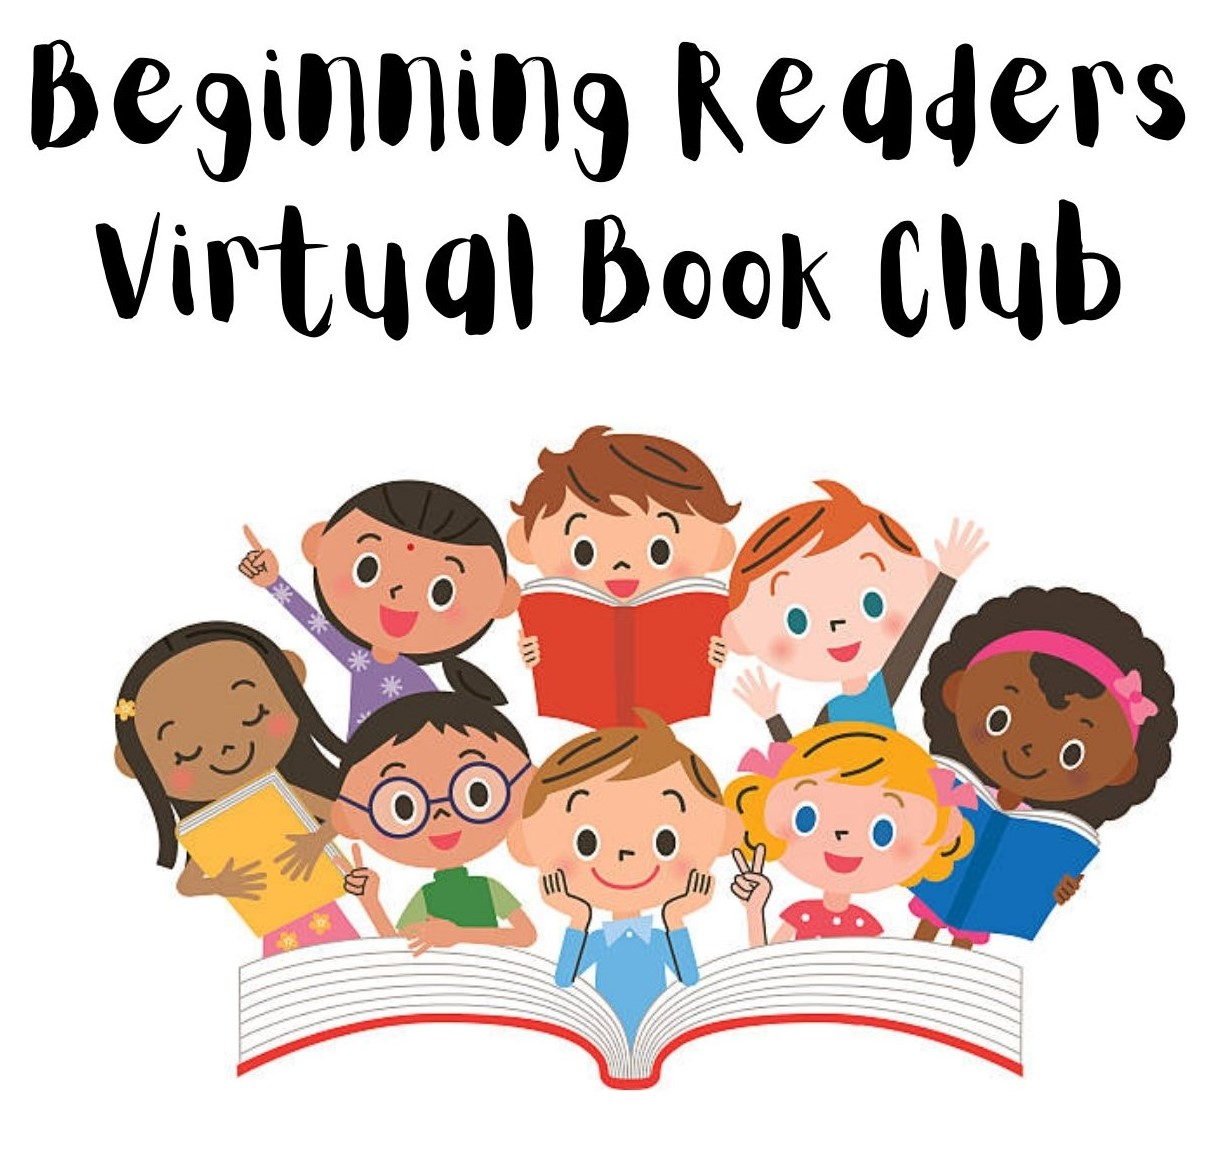 Beginning Readers Virtual Book Club - The Ninjabread Man